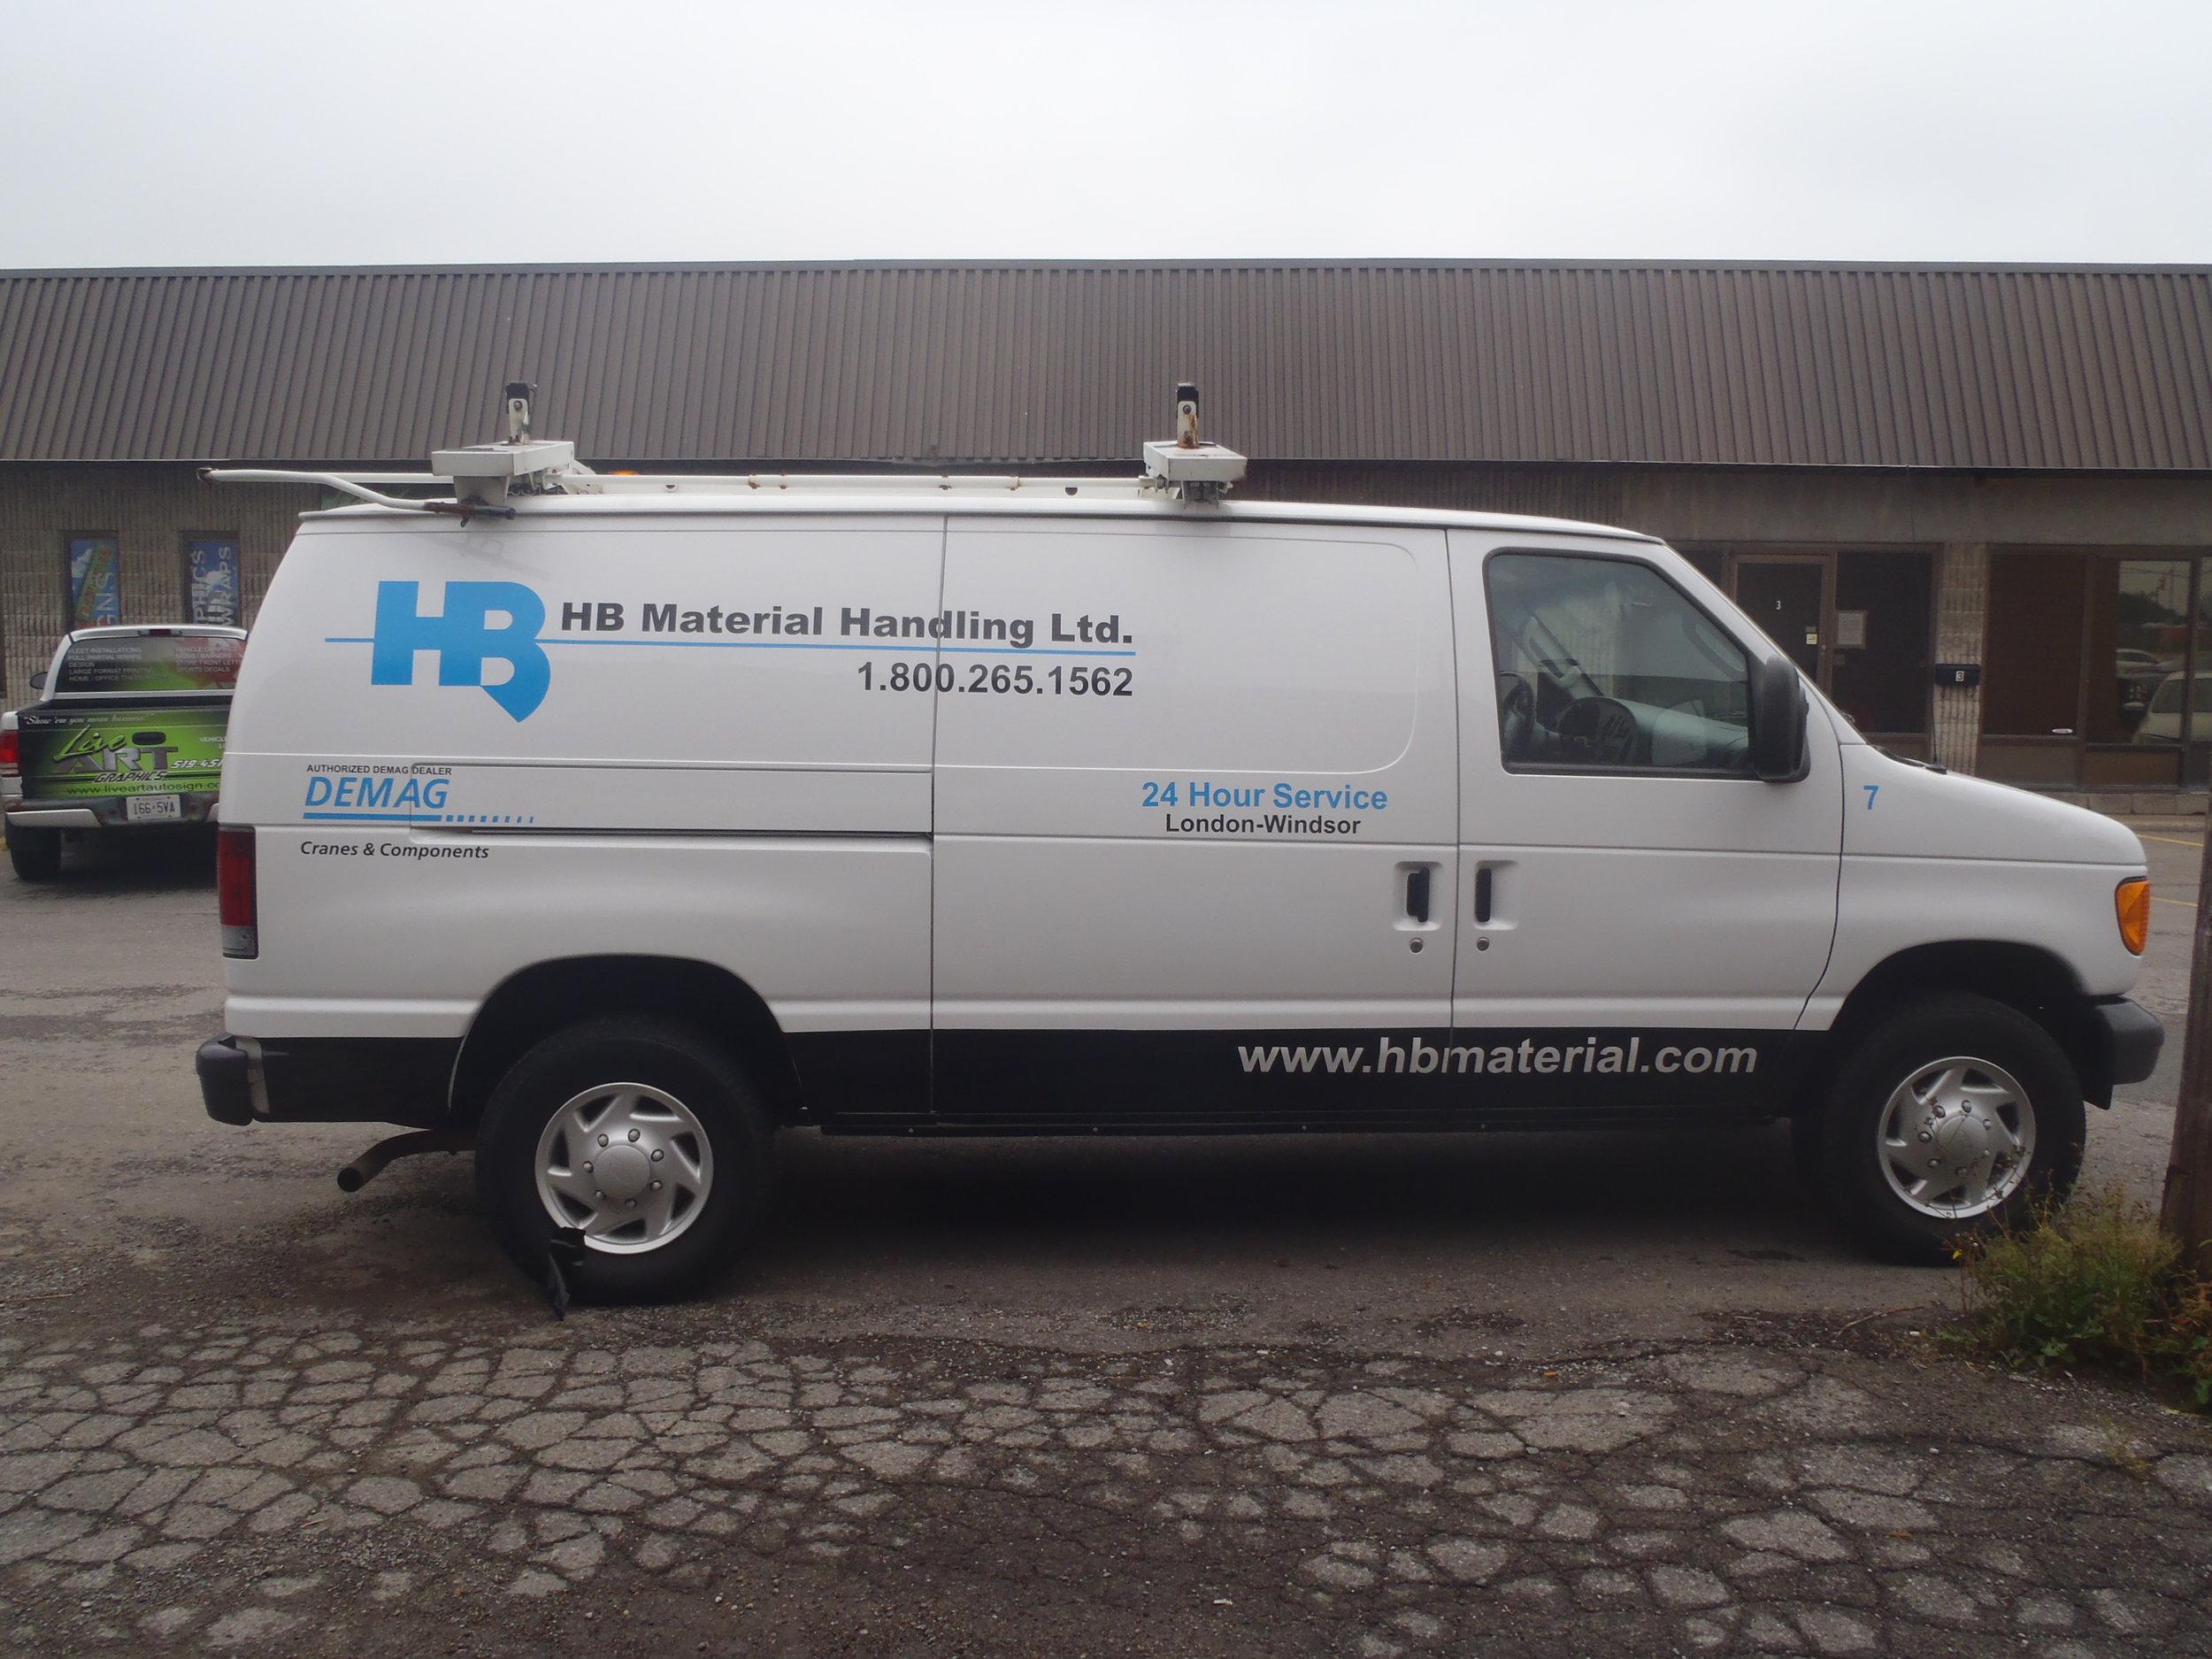 HB Material Handling (1).JPG